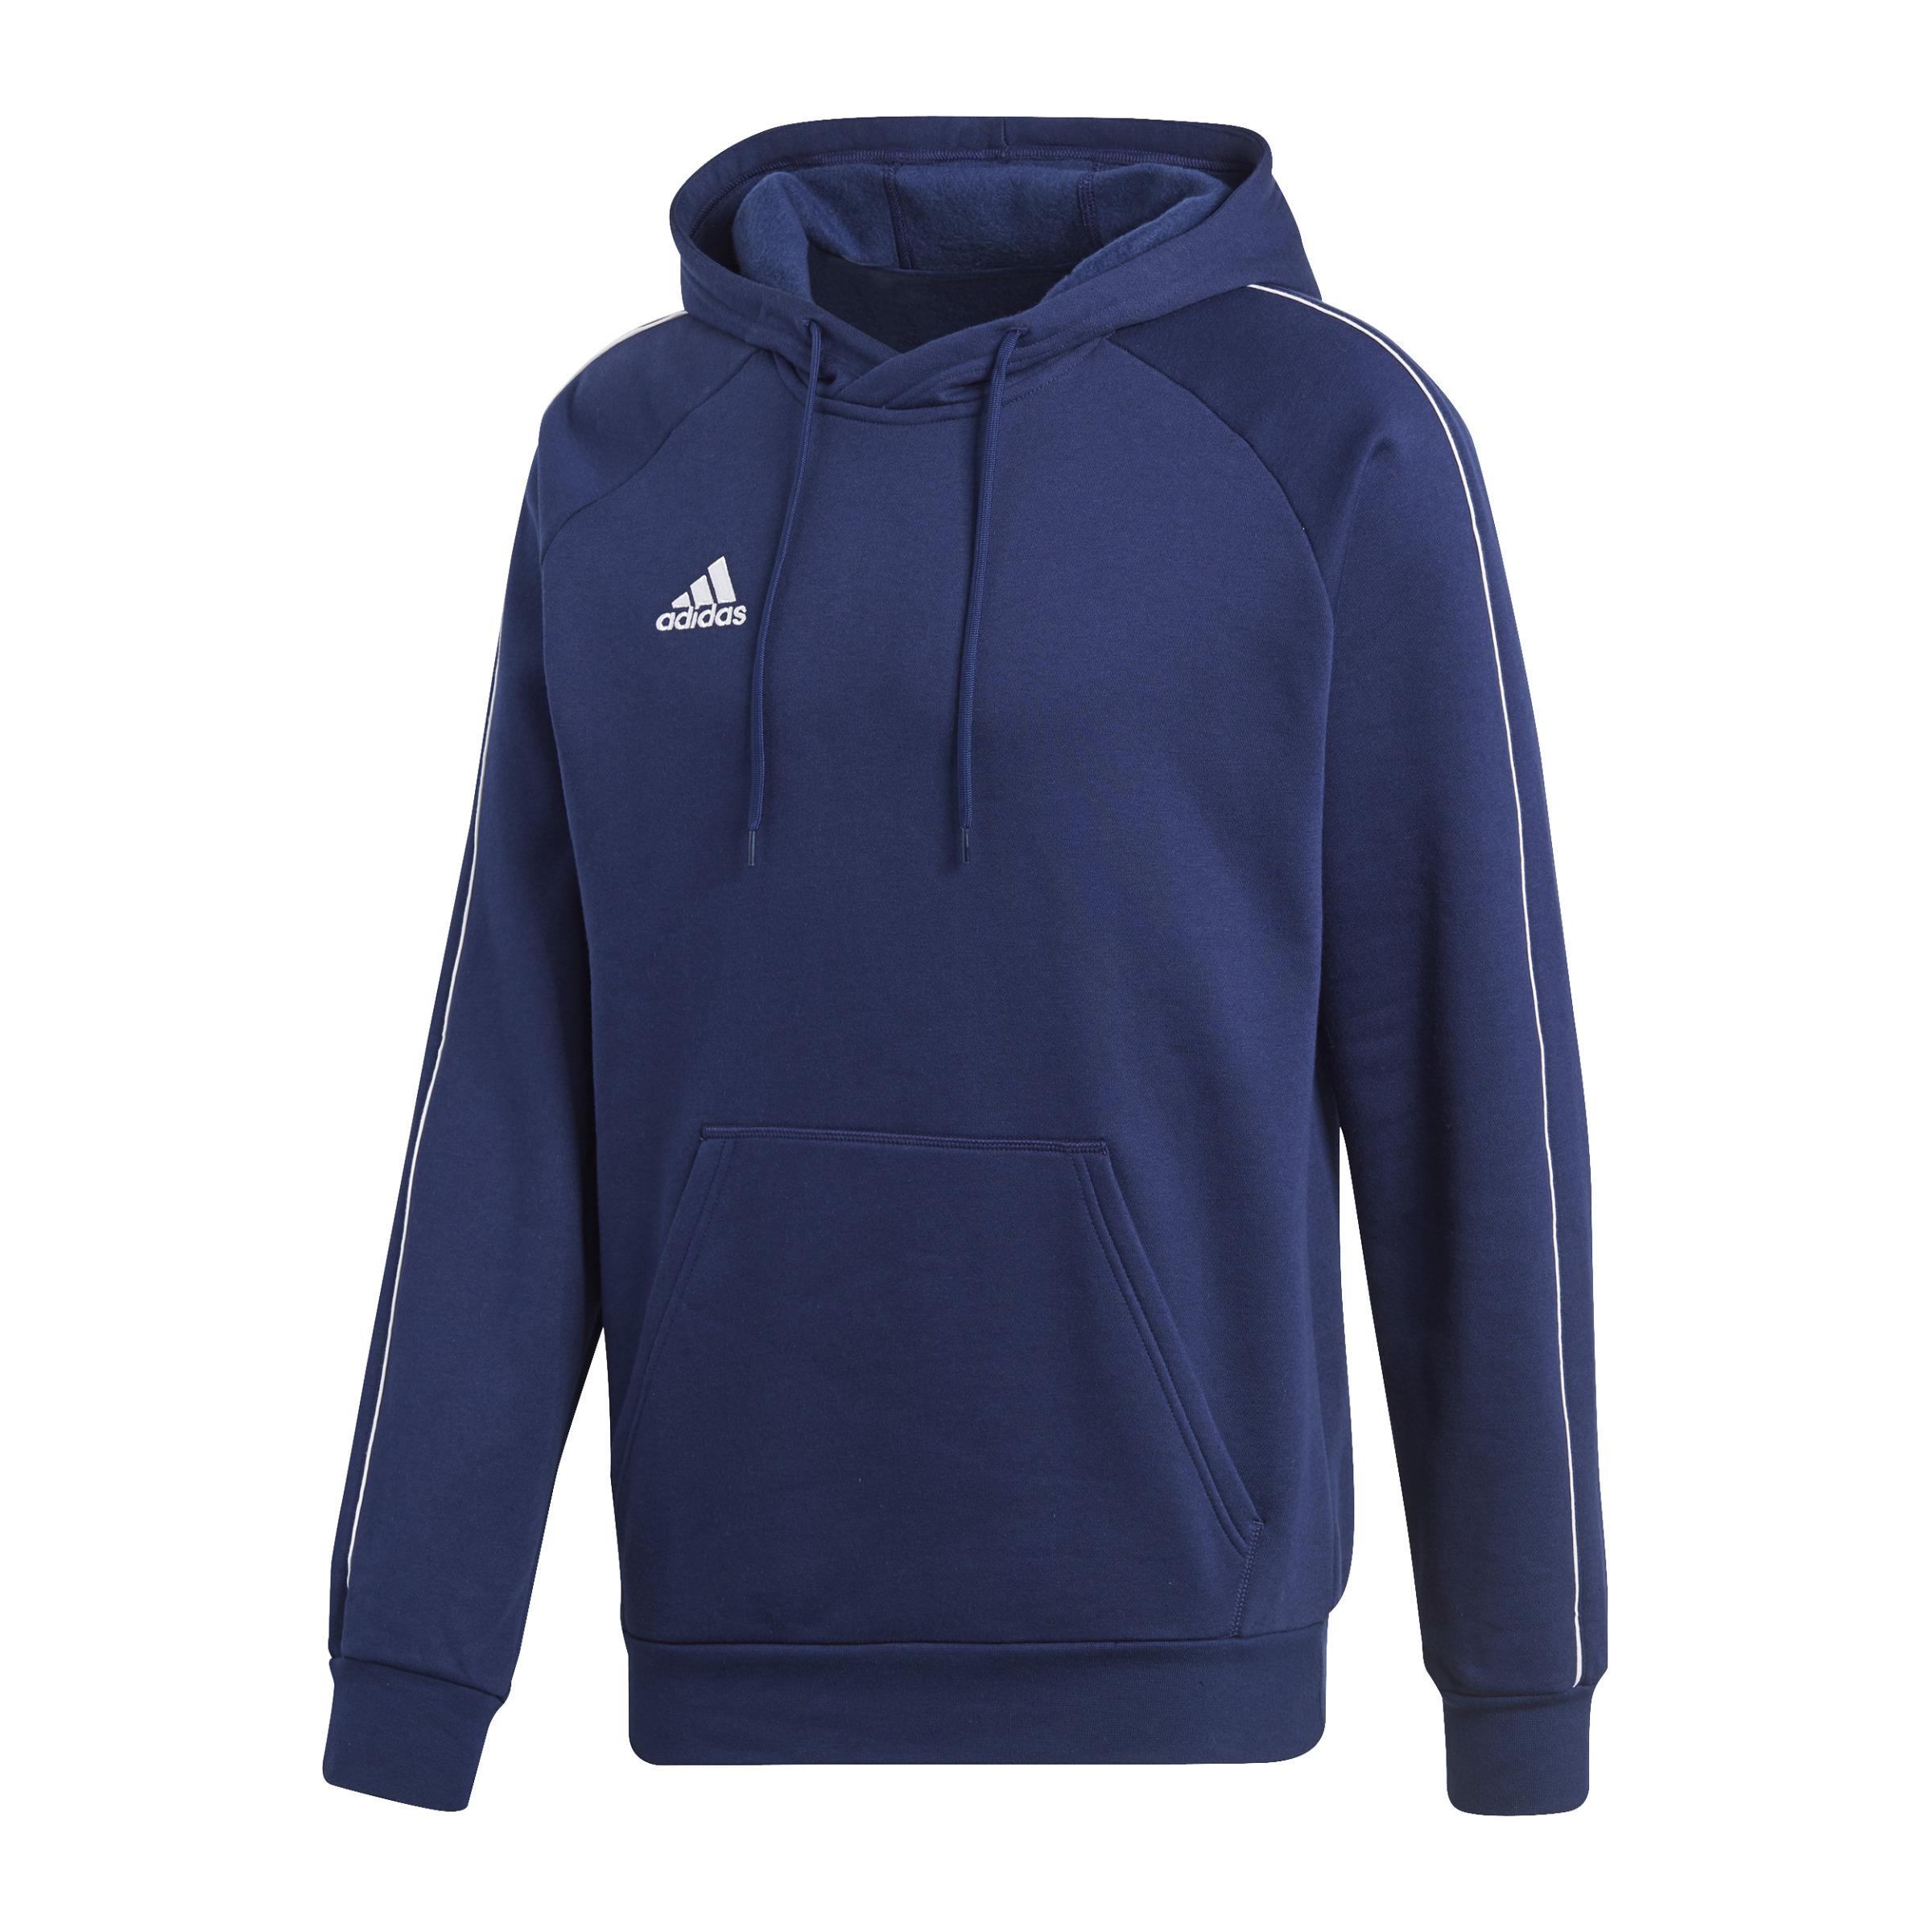 Adidas Core 18 Hoody Felpa per Allenamento con Cappuccio Bianco Blu